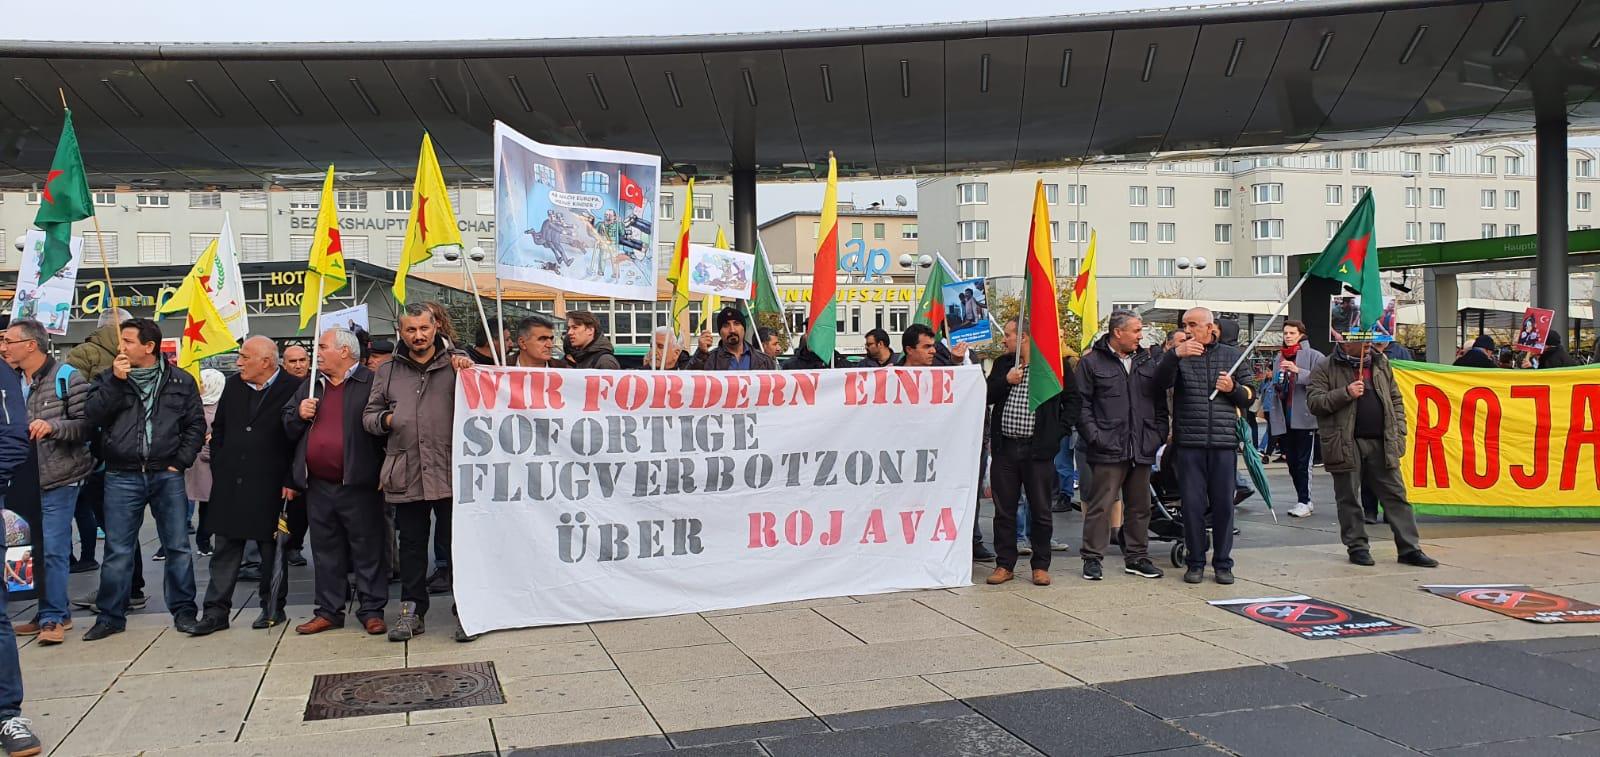 Photo of كراتس النمساوية في اليوم العالمي للتضامن مع روج آفا